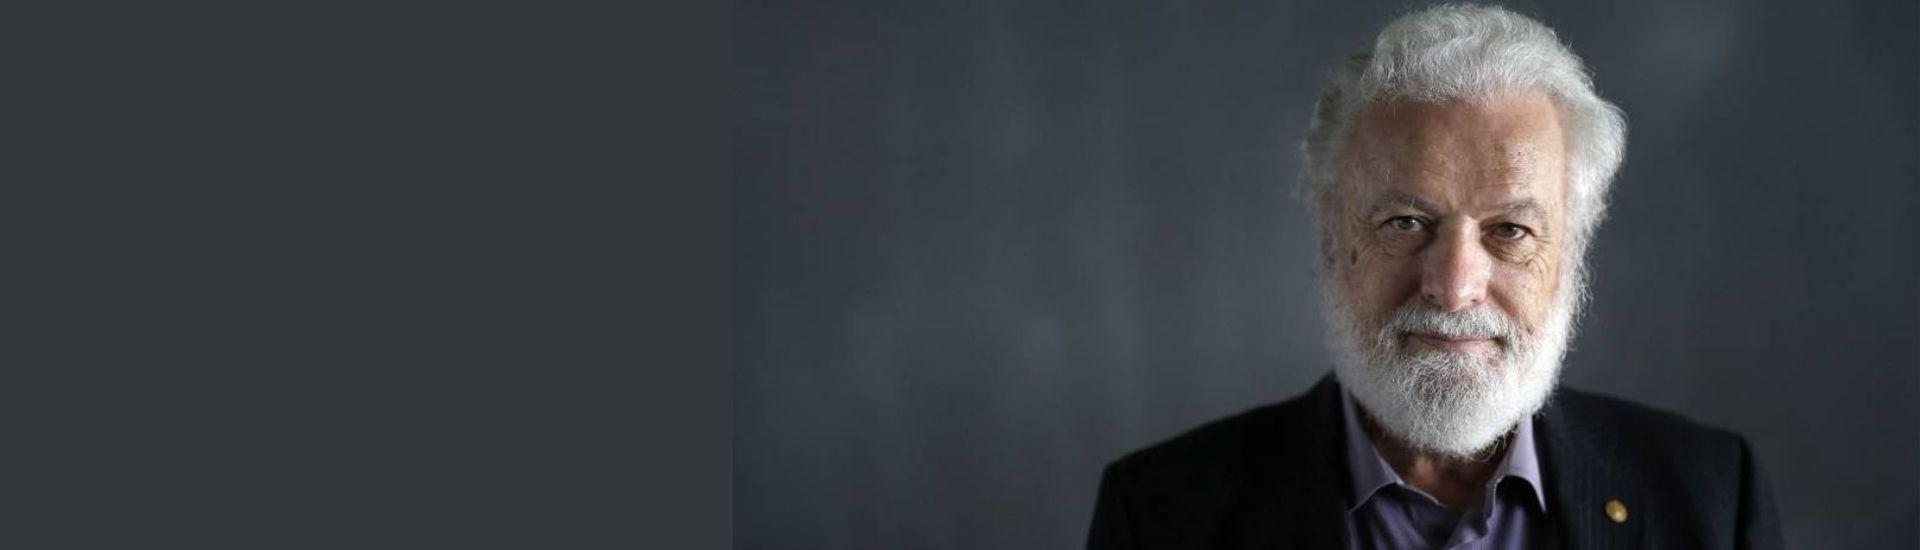 El psicopedagogo, docente y viñetista, Frato Tonucci, se ve en primer plano